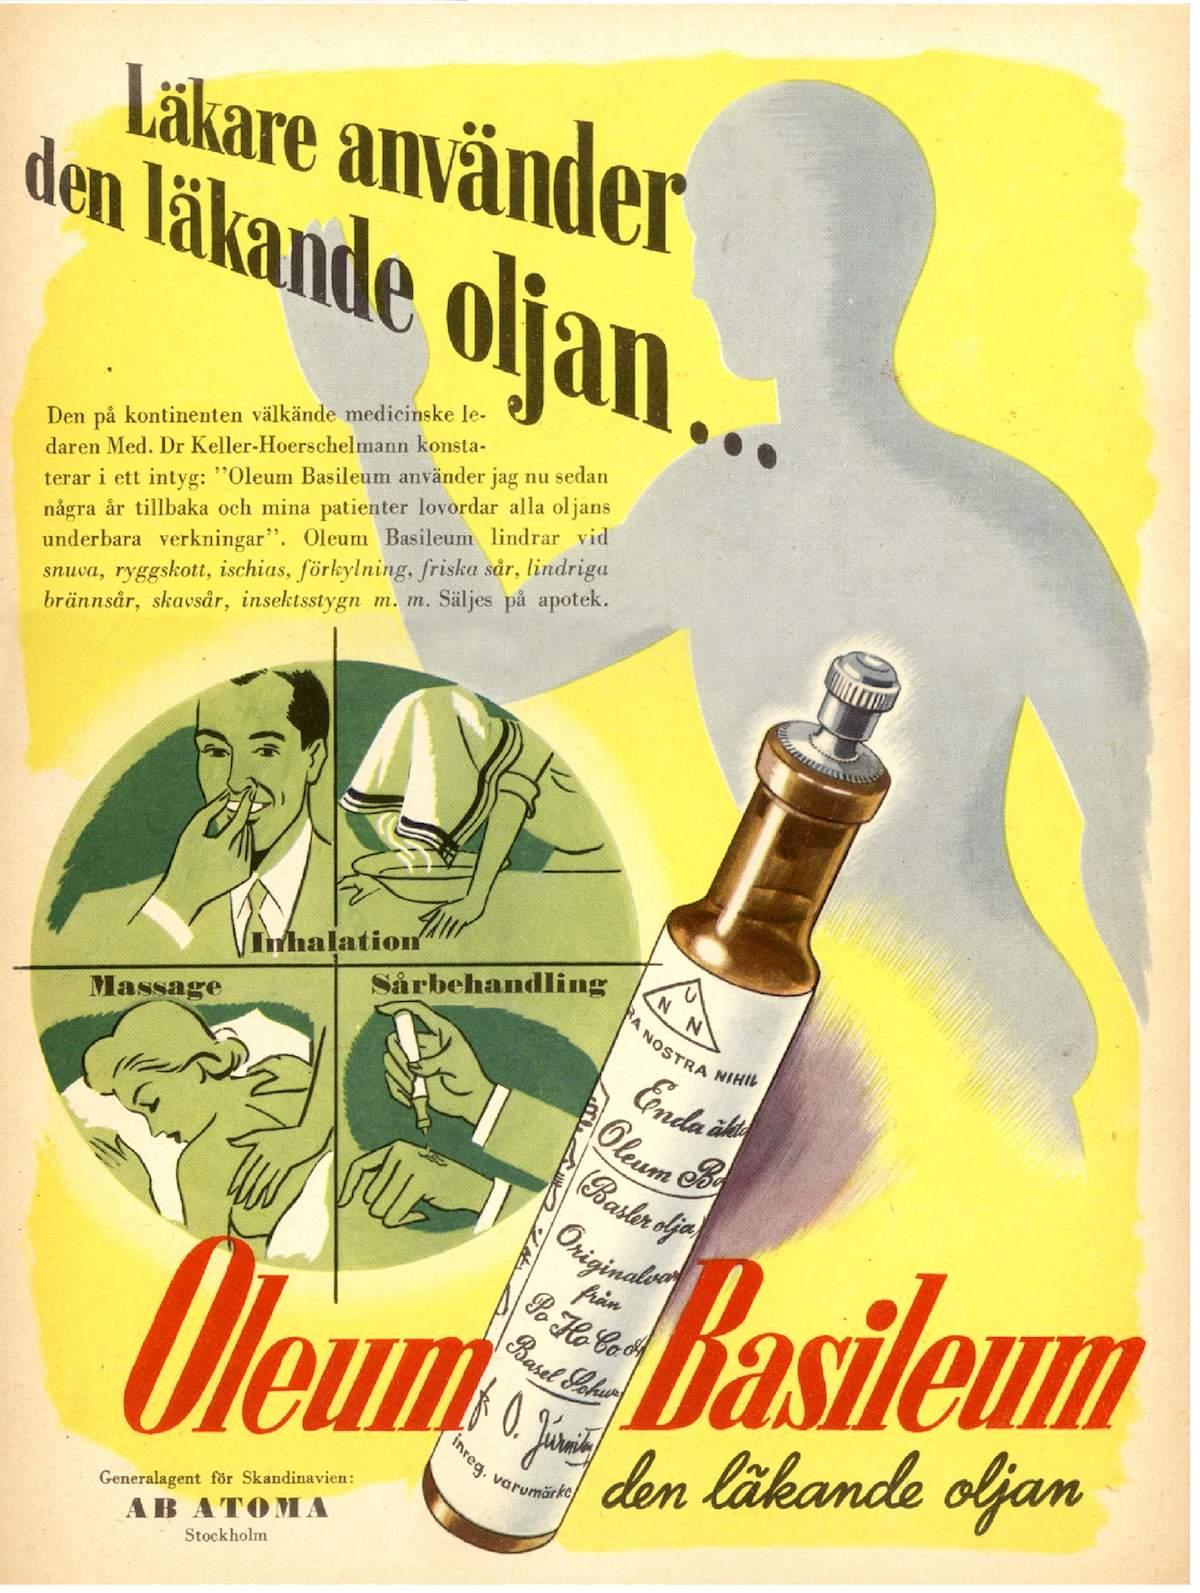 Oleum Basileum - Produktfoto: AB Atoma